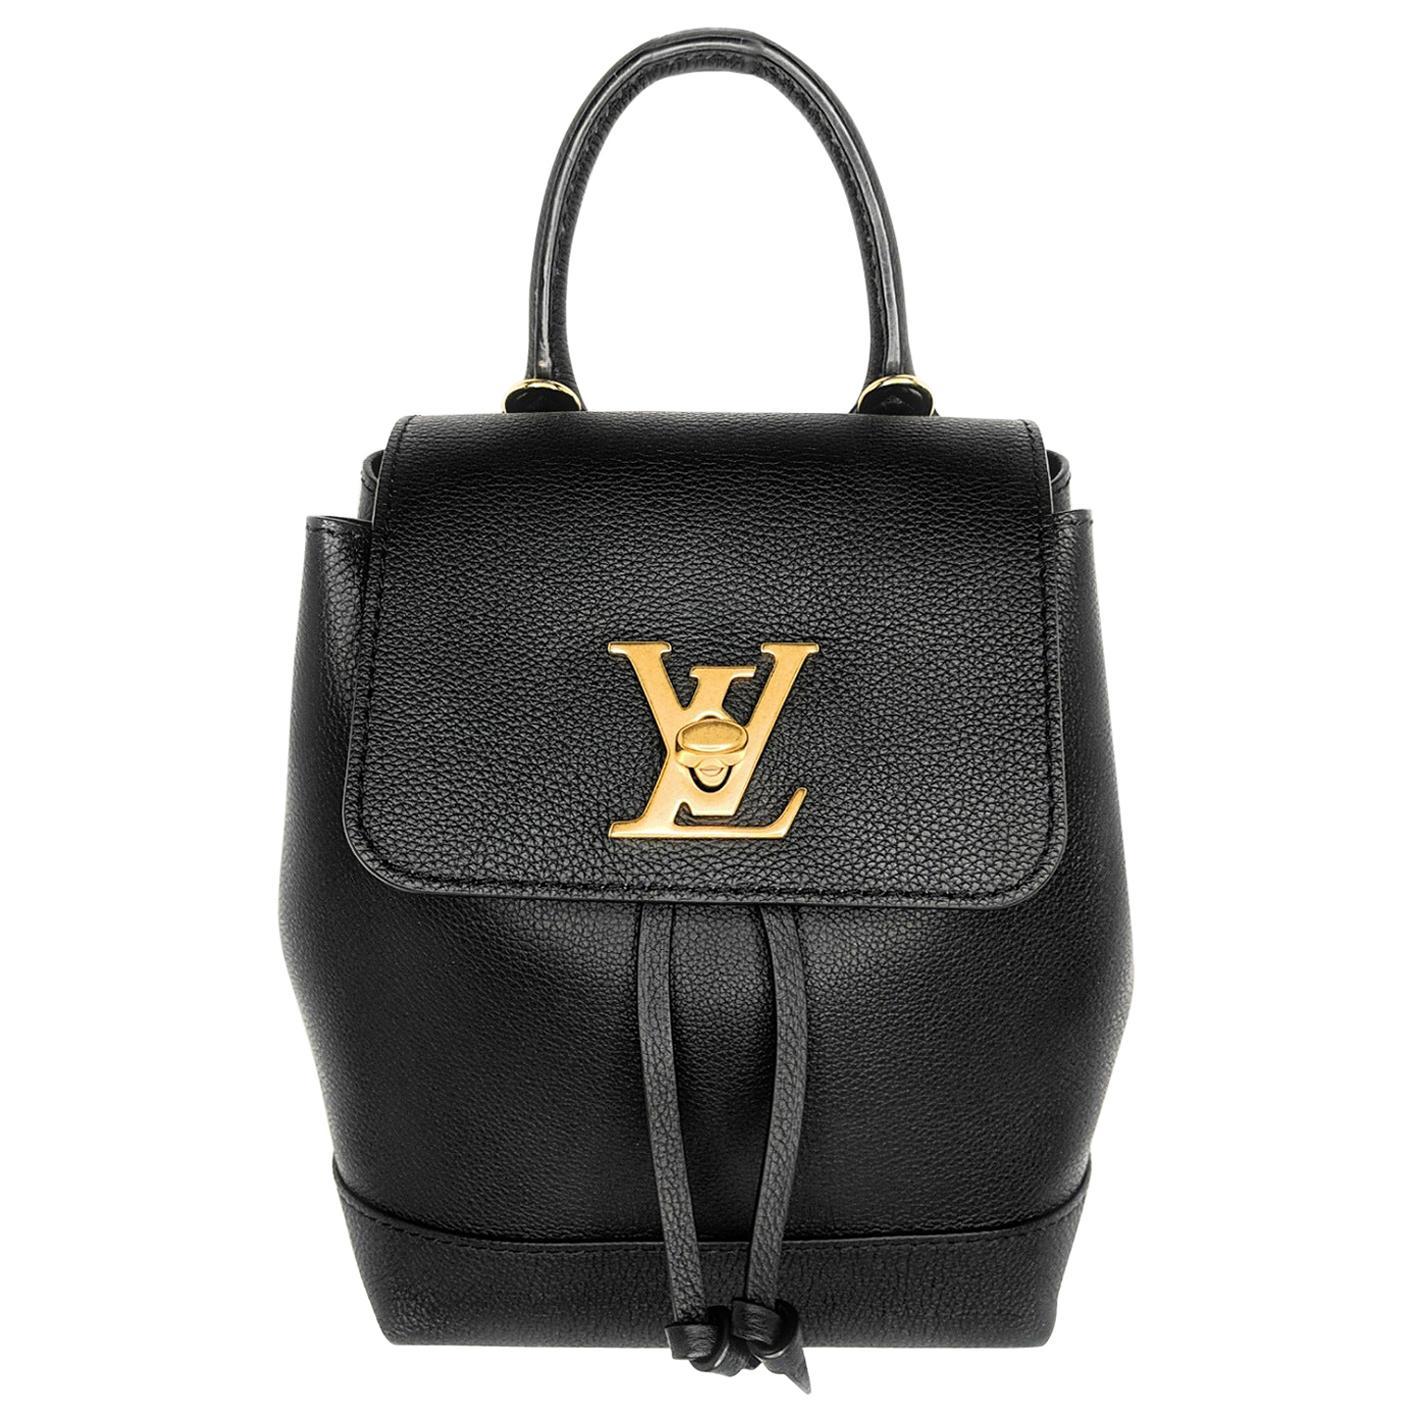 Louis Vuitton Black Calfskin Mini Lockme Backpack